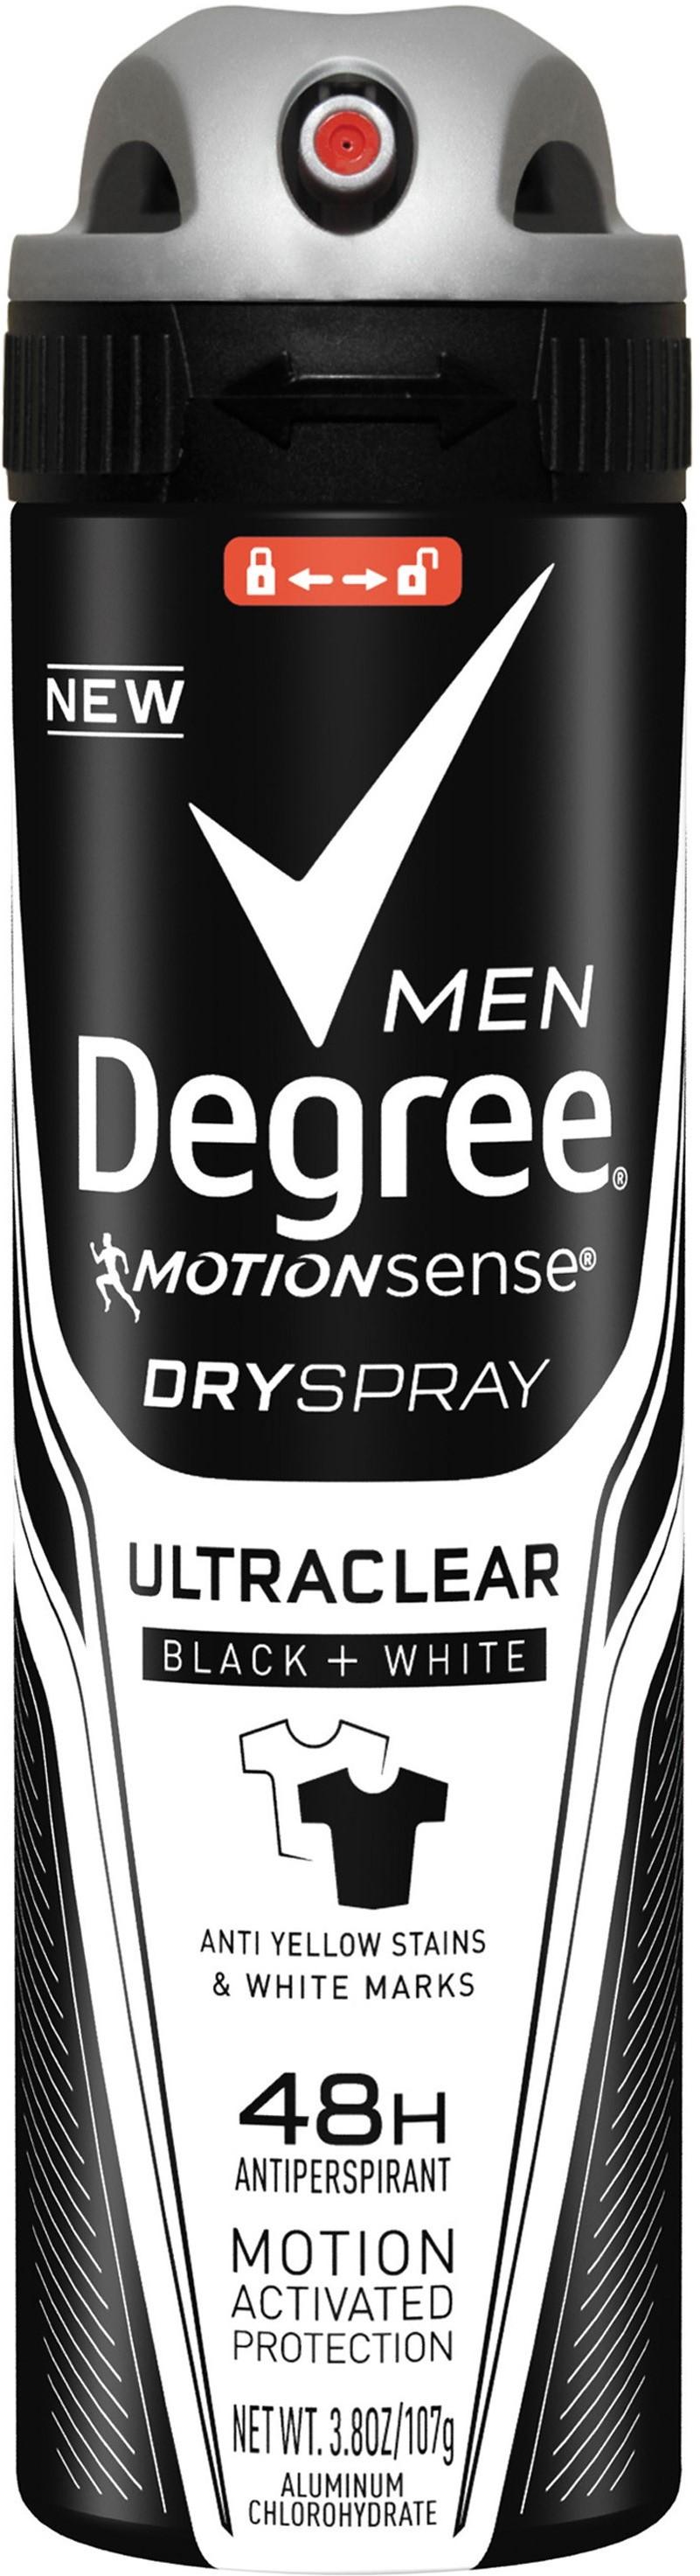 best spray on deodorant, Best Spray On Deodorants – Degree